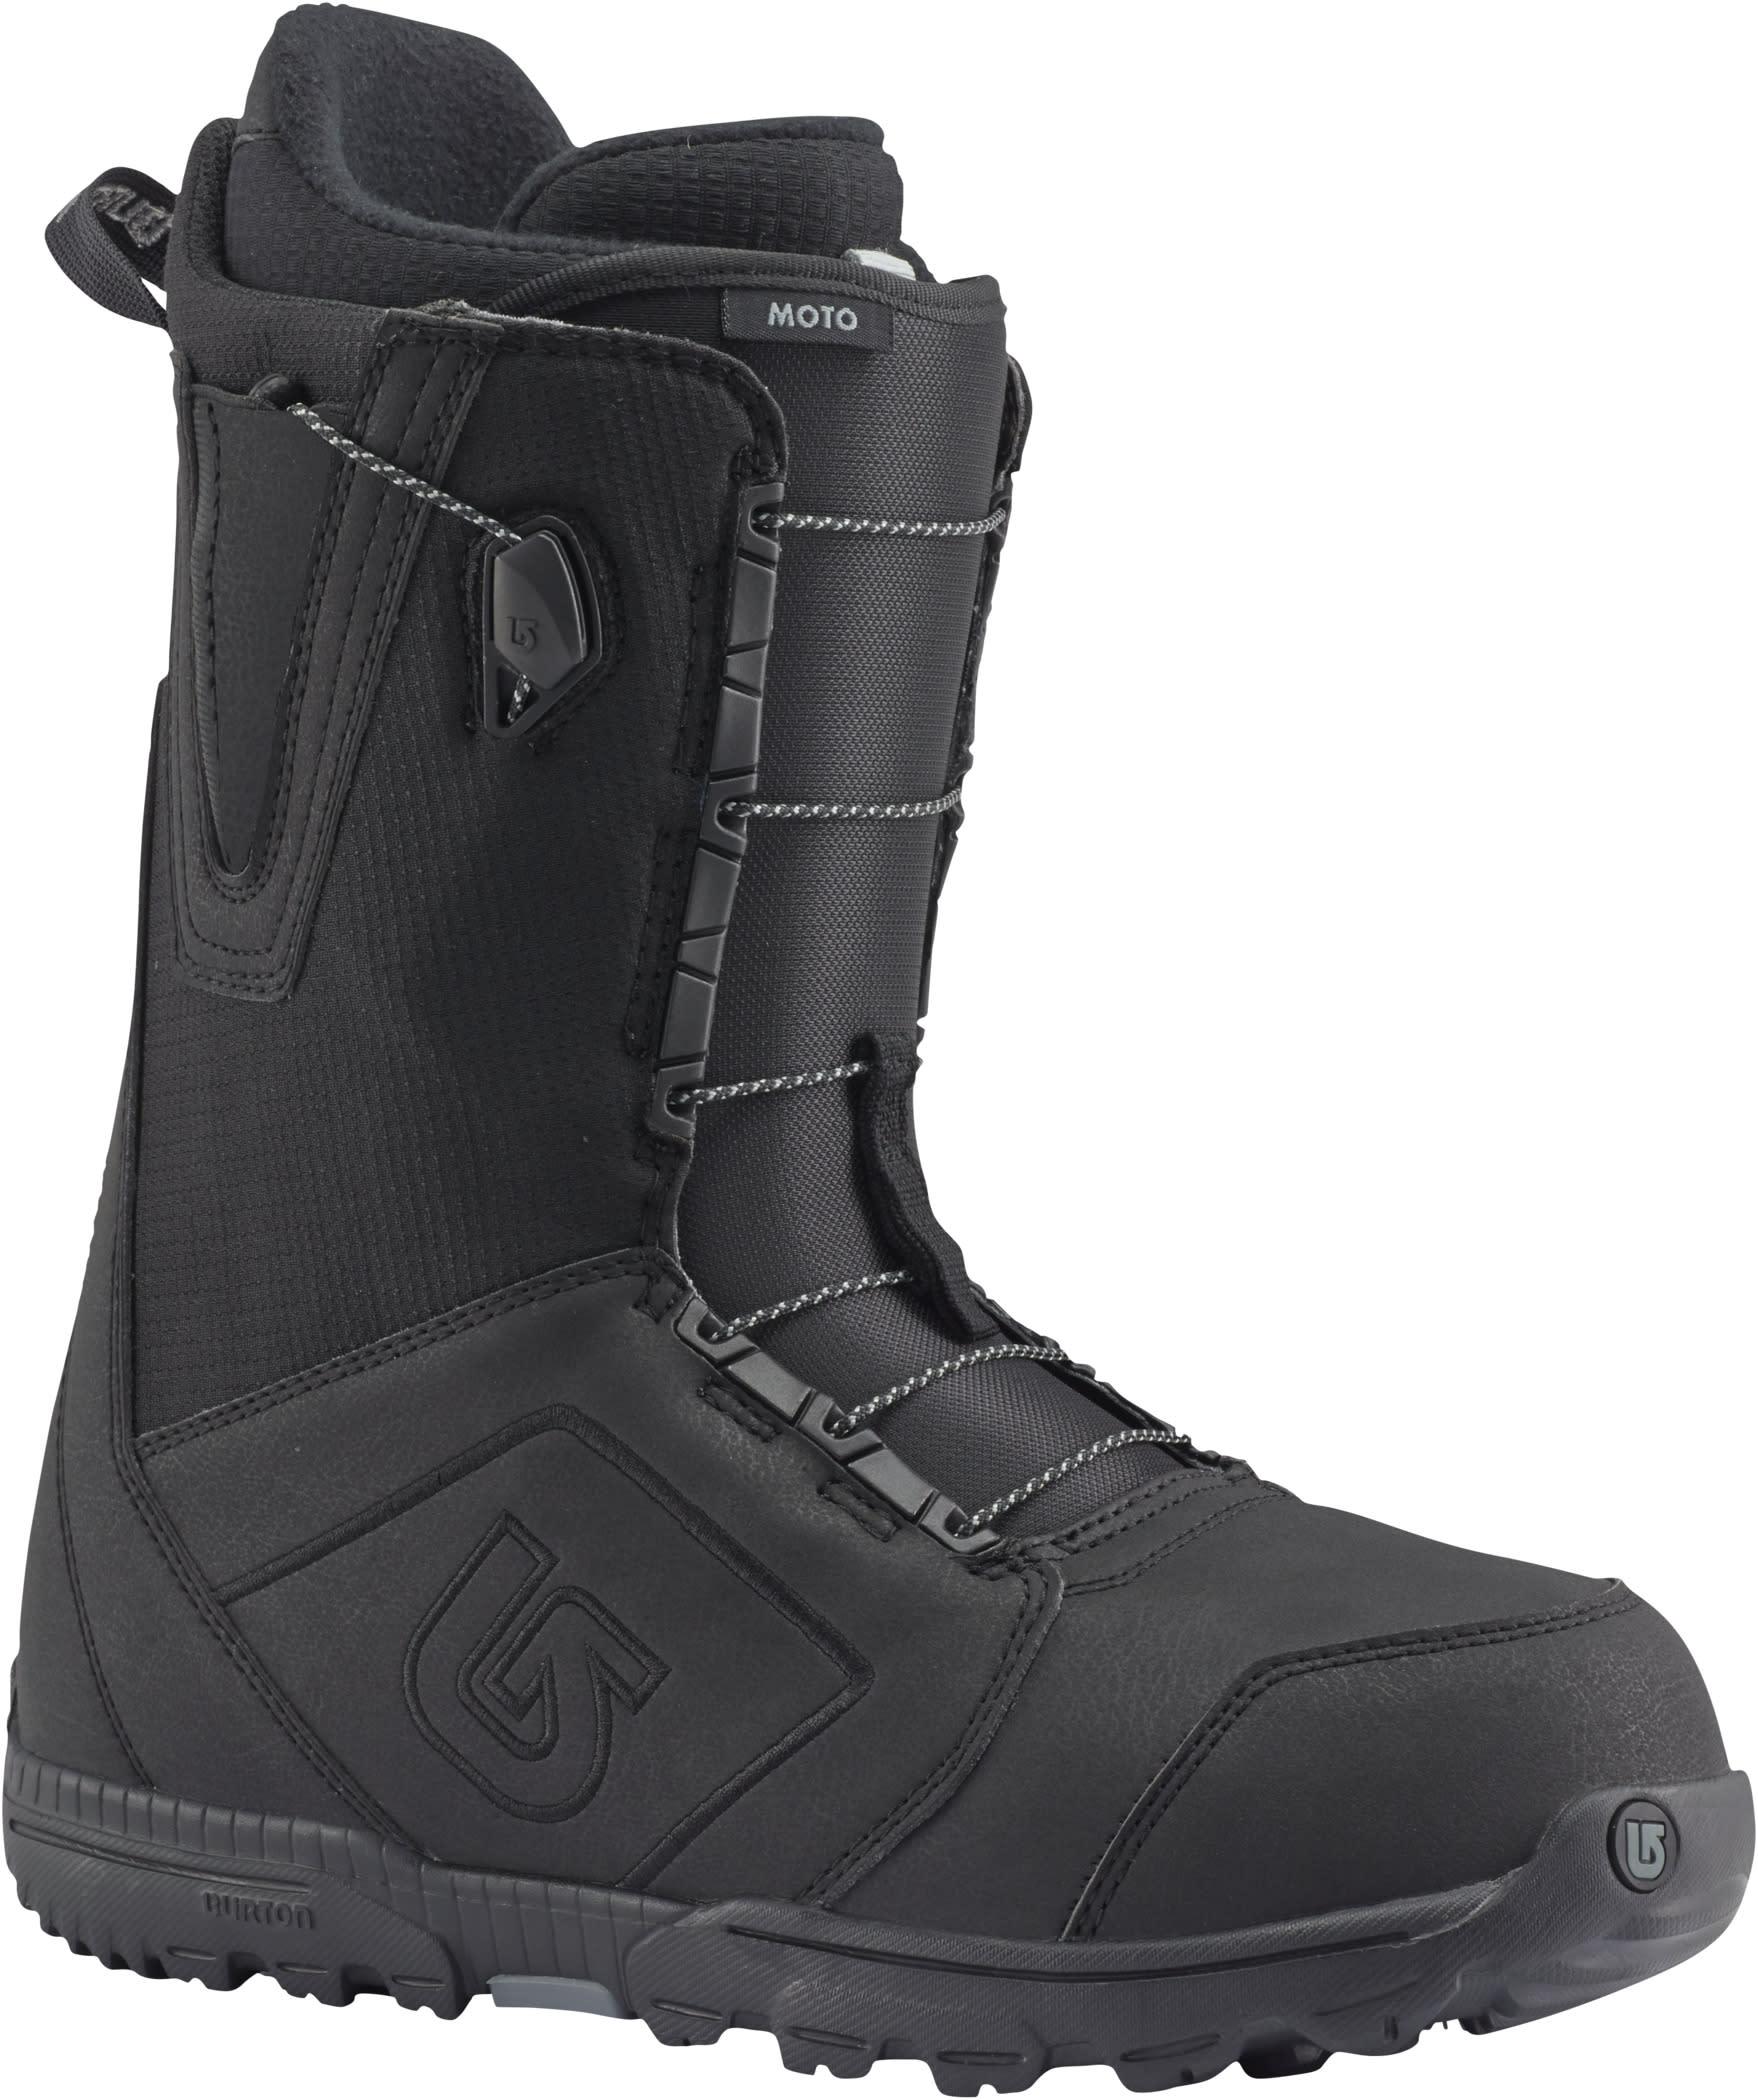 Ski Boots Sale >> Burton Moto R Snowboard Boots